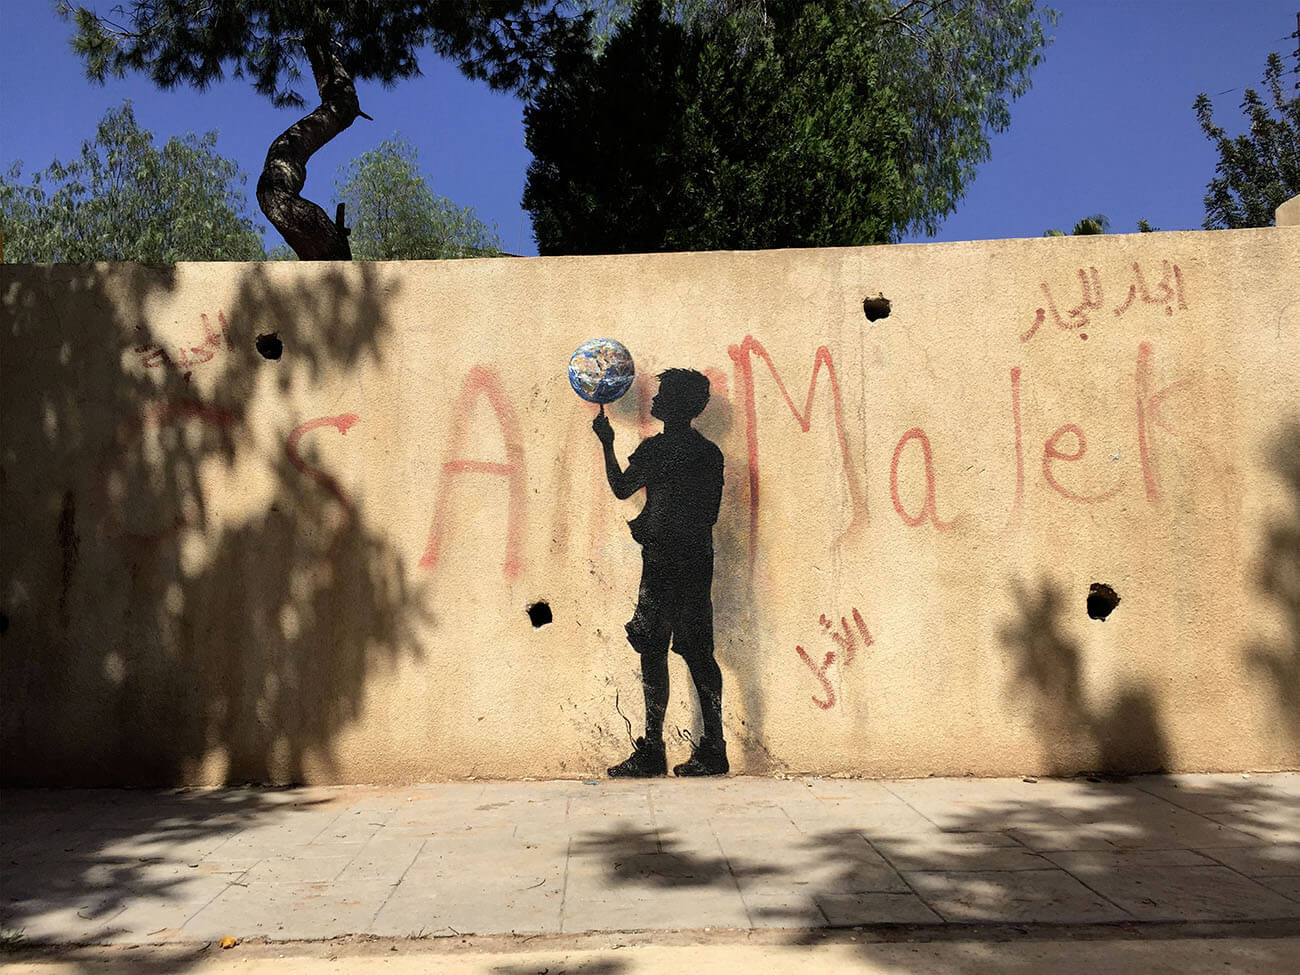 Pejac in Jabal Al-Weibdeh, Amman Jordan 2016